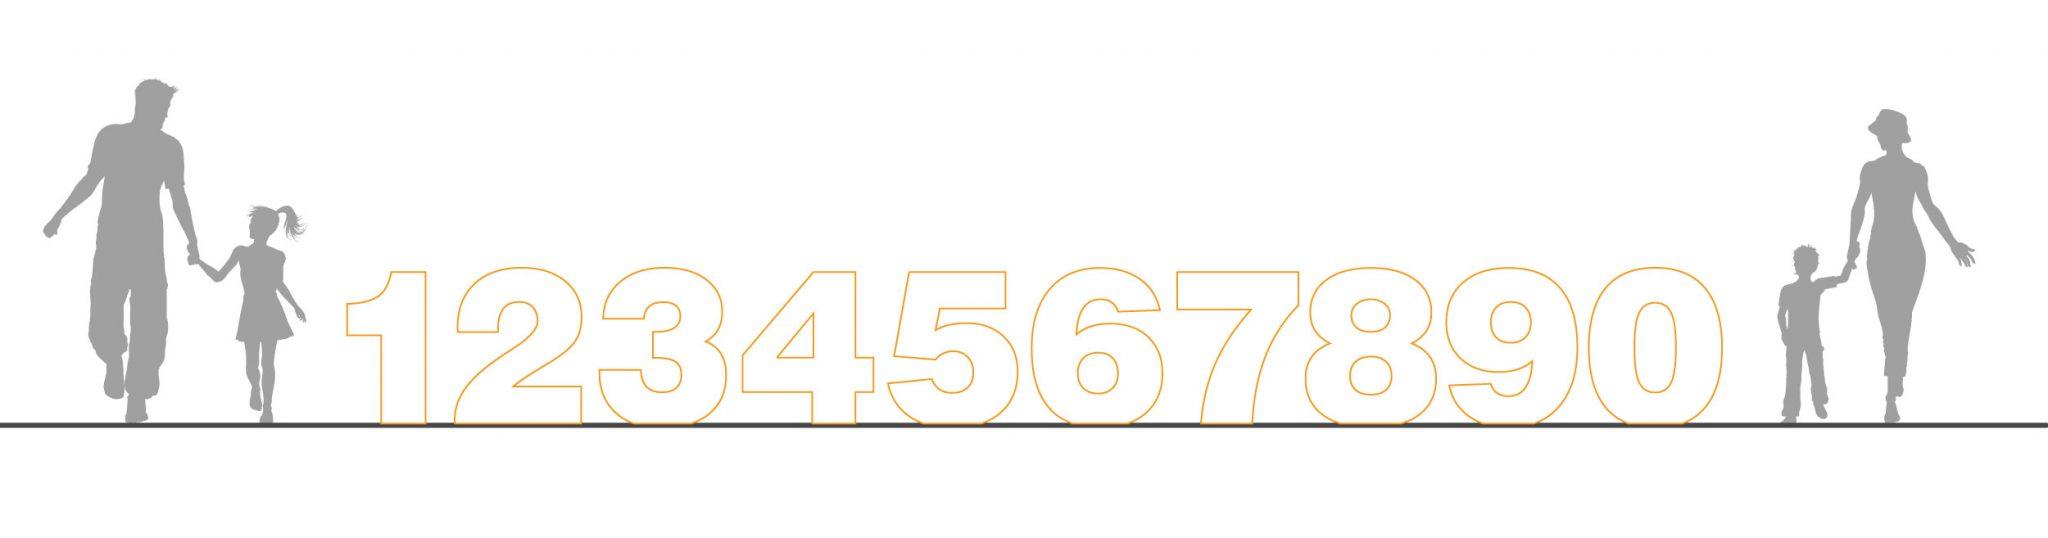 números luminosos gráfico